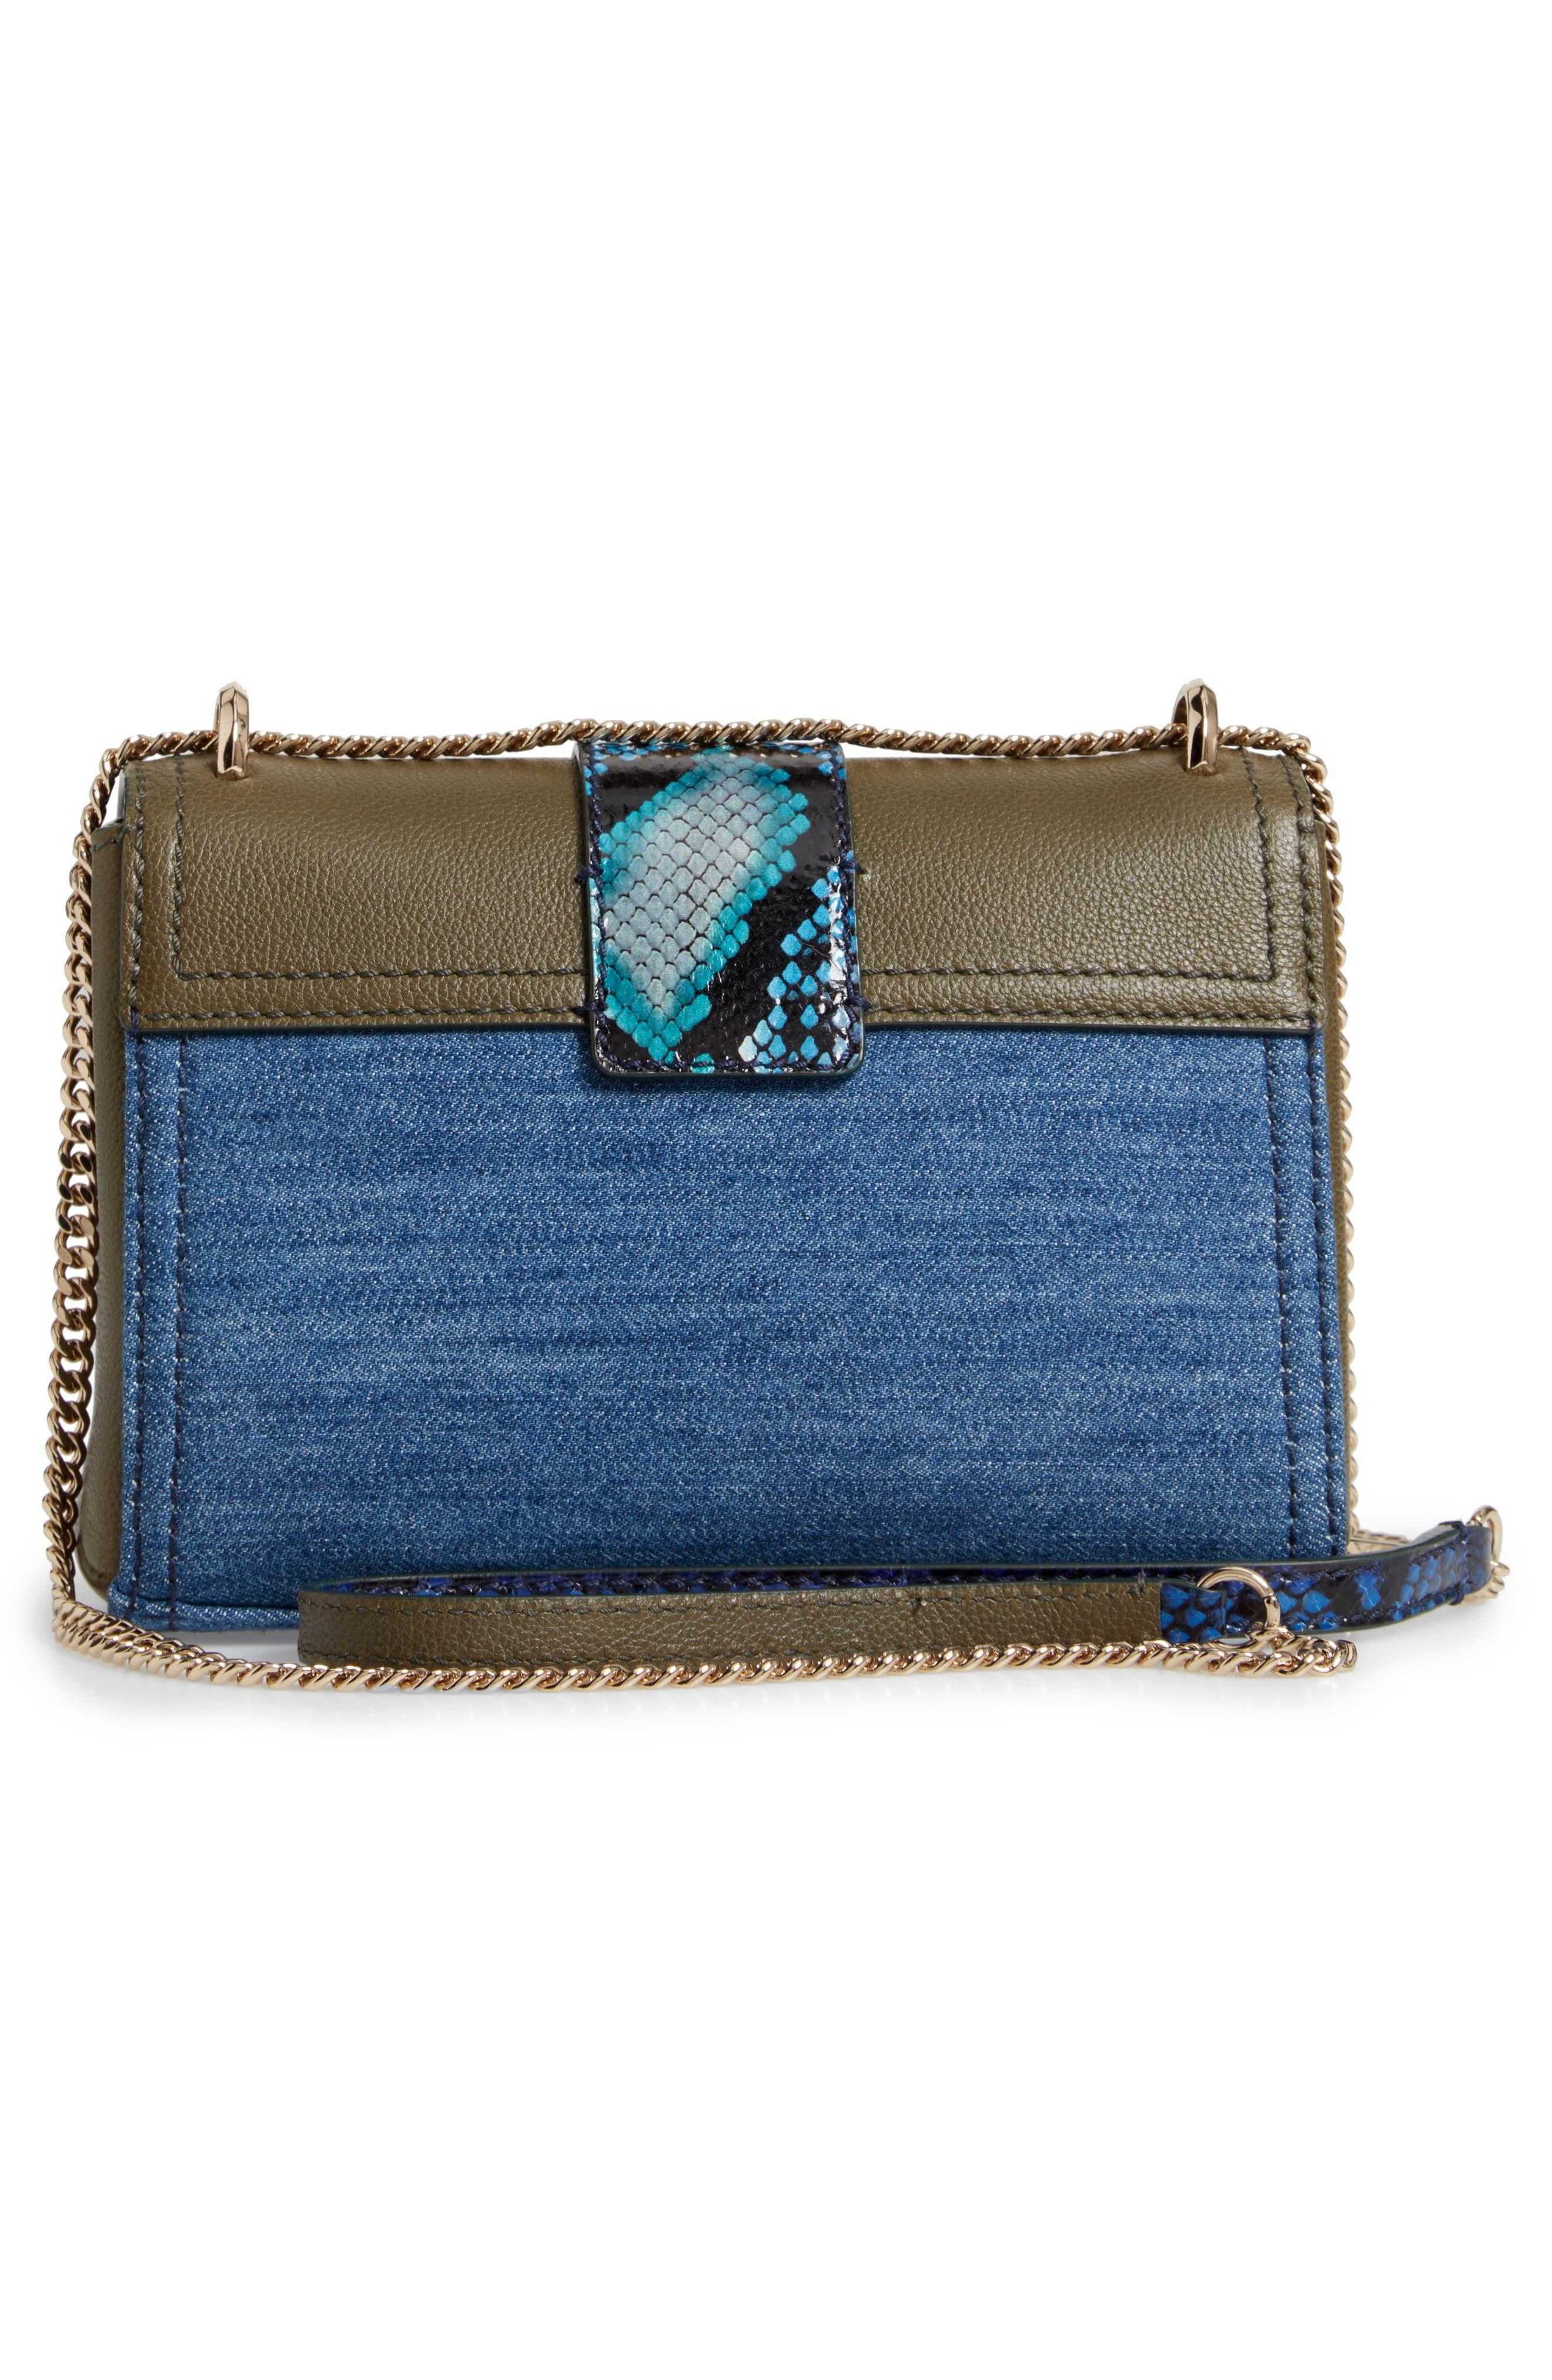 Marianne Leather & Genuine Snakeskin Crossbody Bag,                             Alternate thumbnail 4, color,                             NAVY MIX